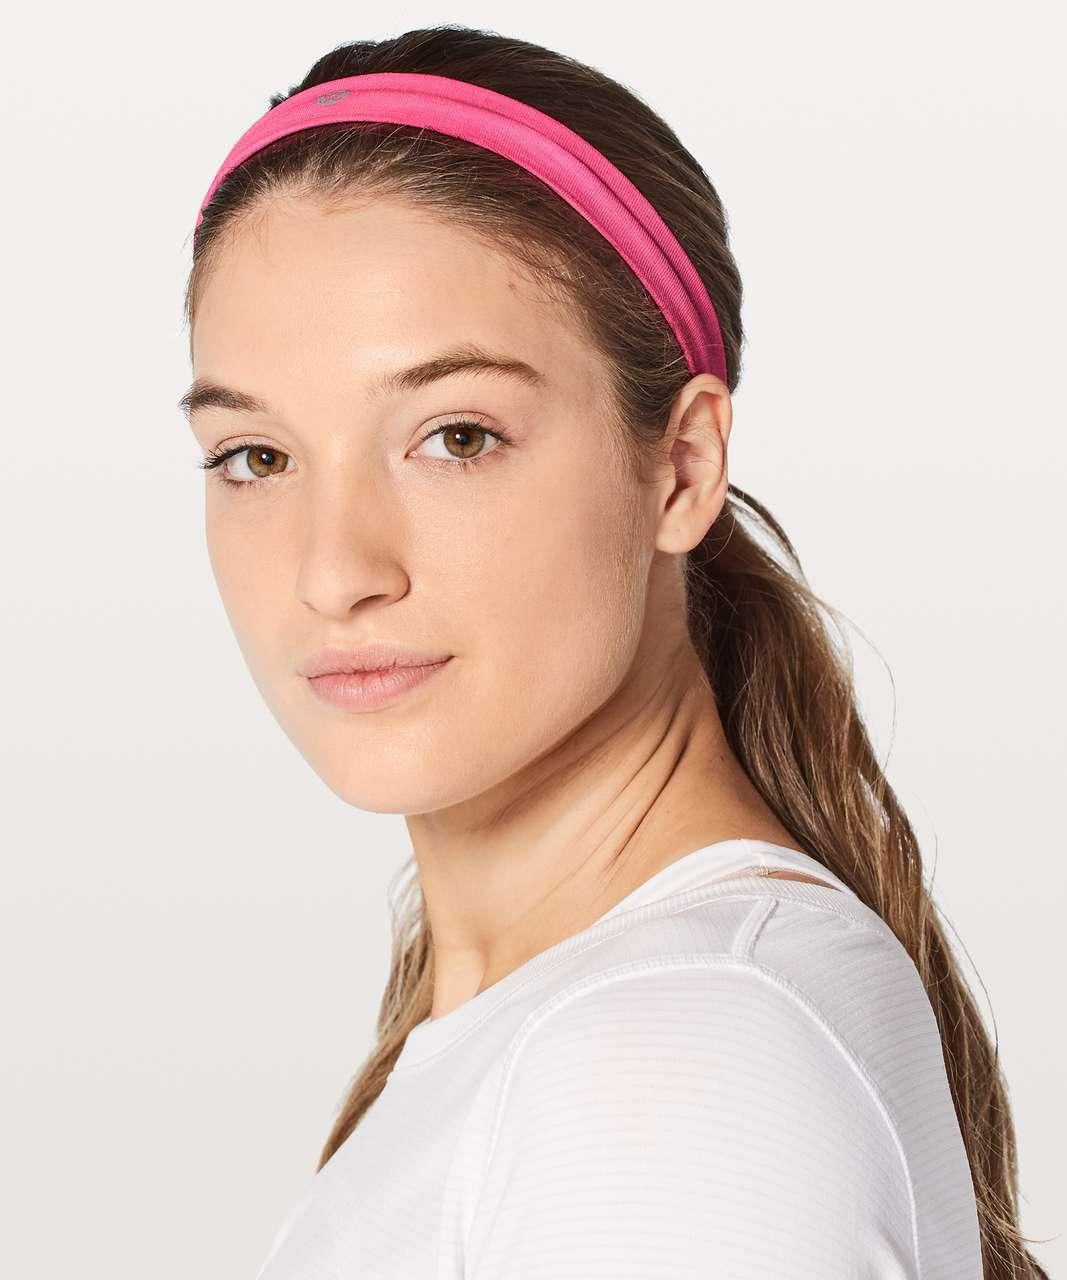 Lululemon Cardio Cross Trainer Headband - Neon Pink / White